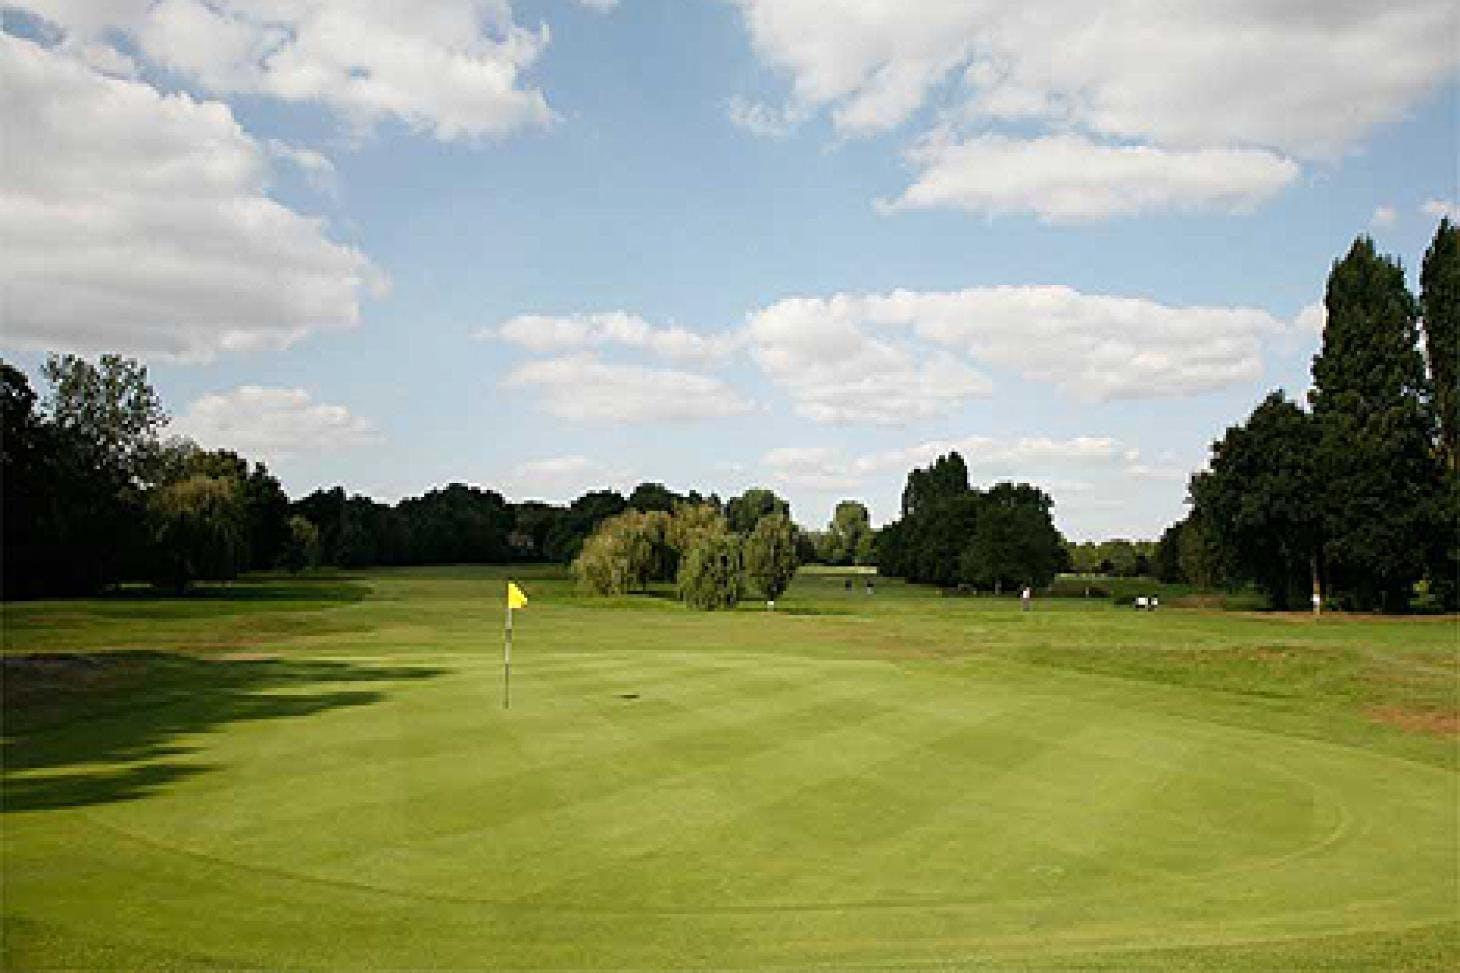 Malden Golf Club 18 hole golf course